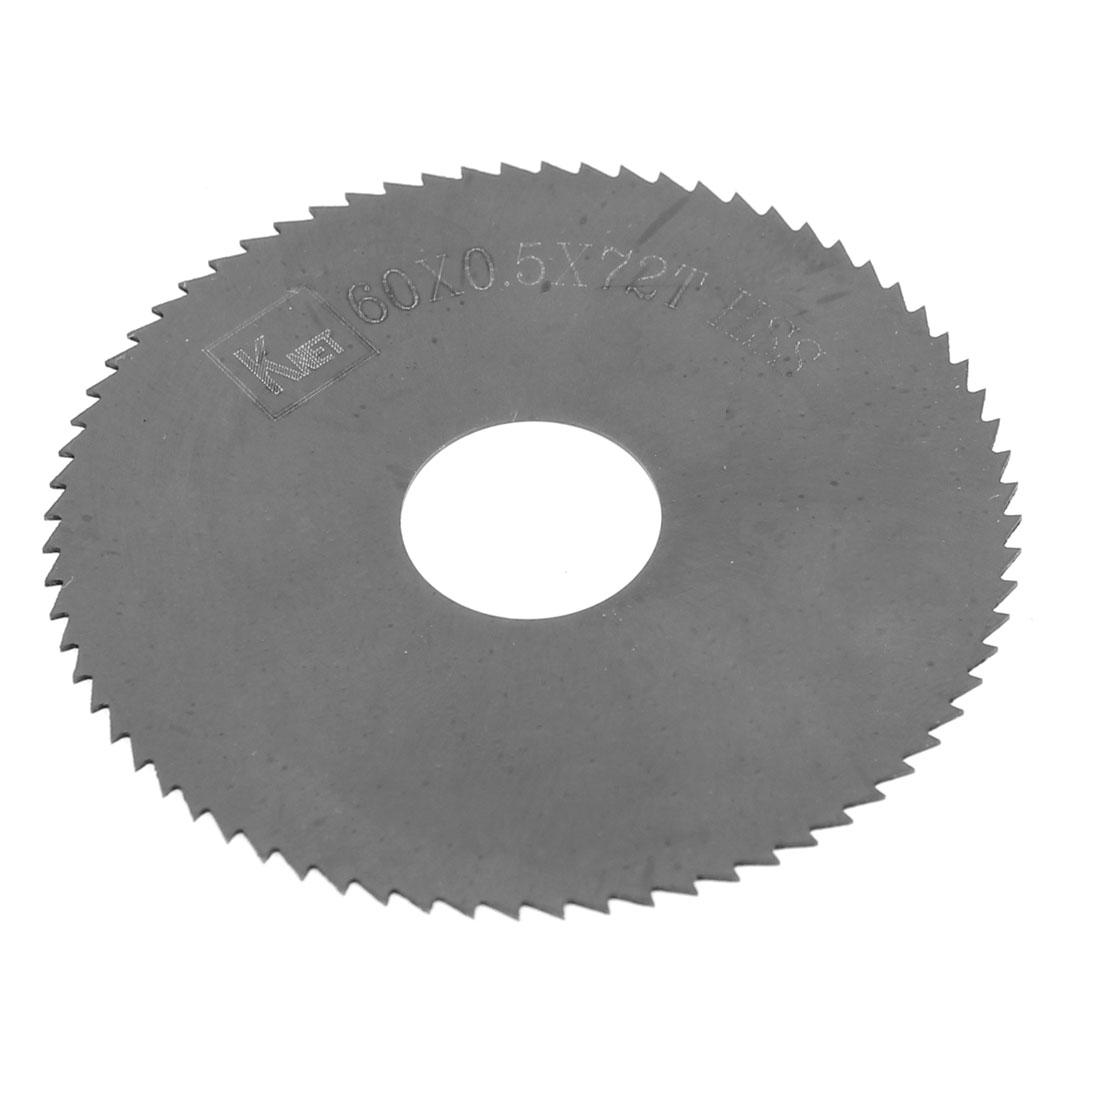 HSS 72 Teeth 60mm x 0.5mm x 16mm Slitting Saw Spare Part